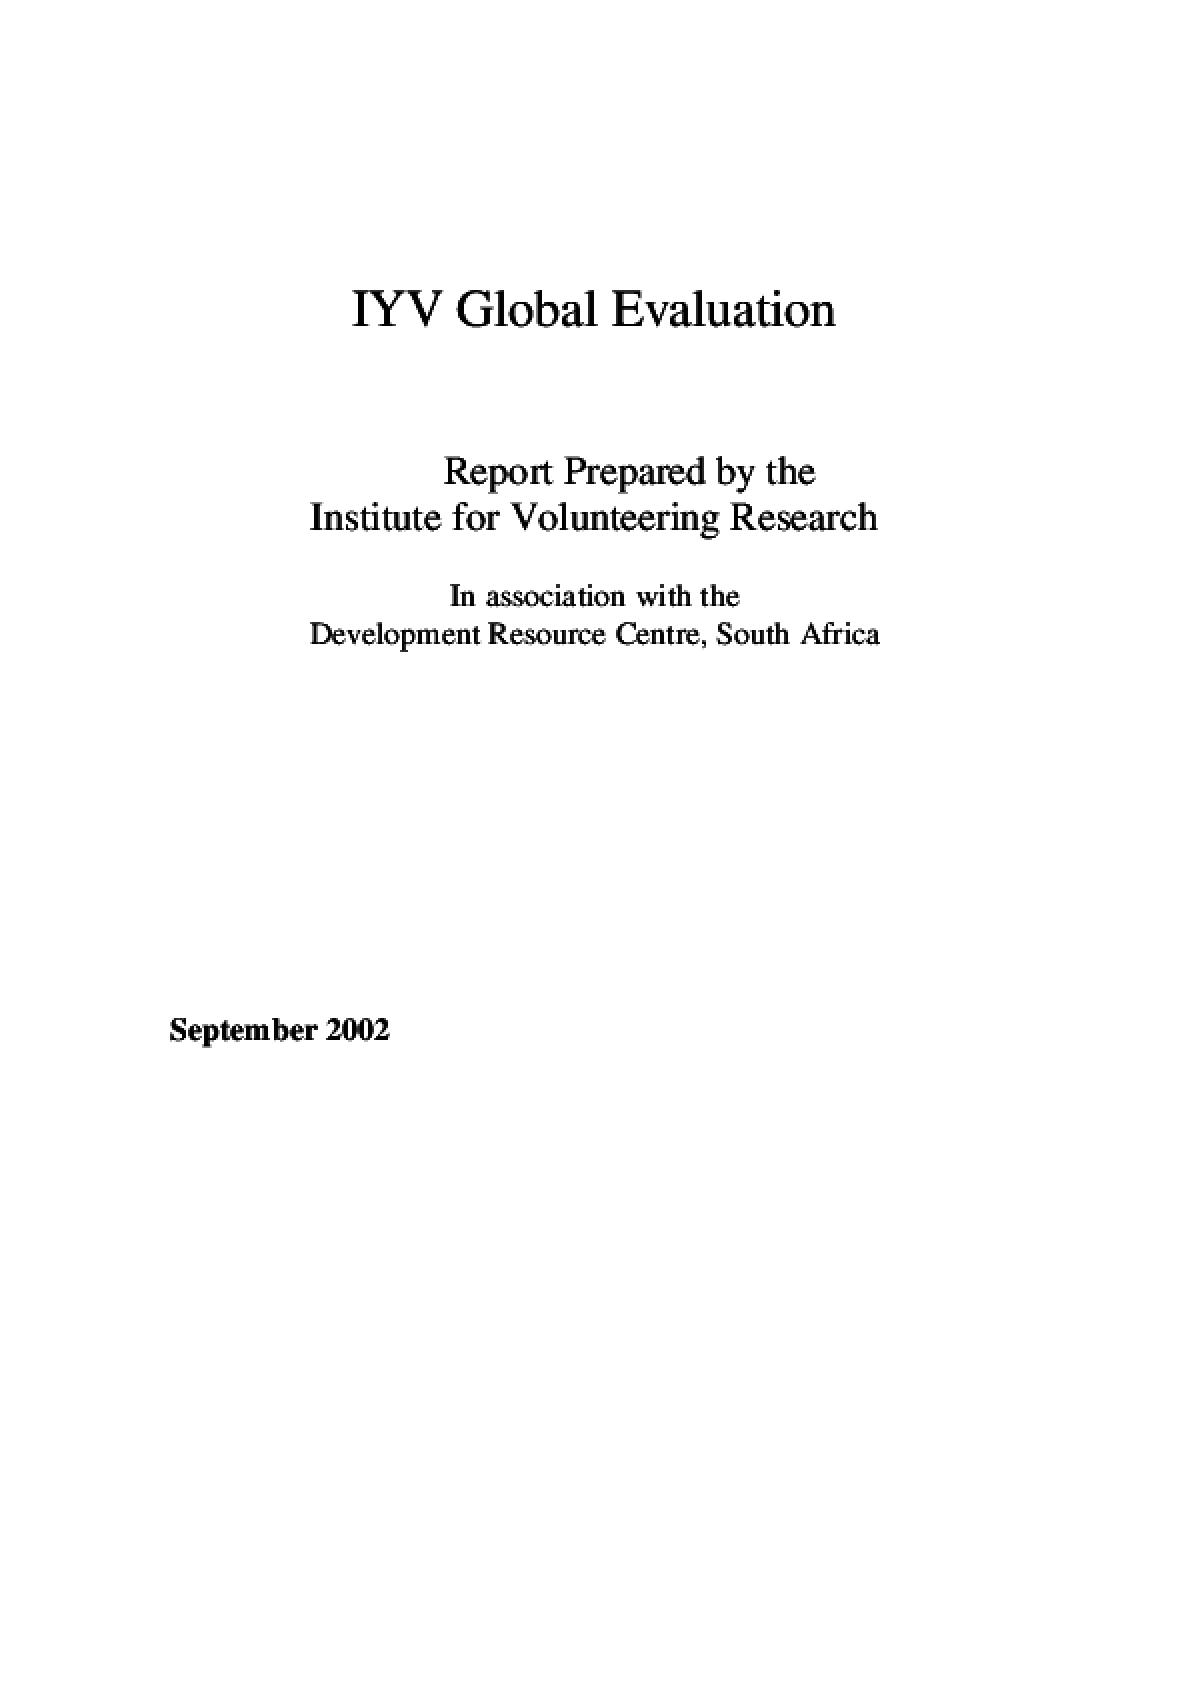 IYV Global Evaluation